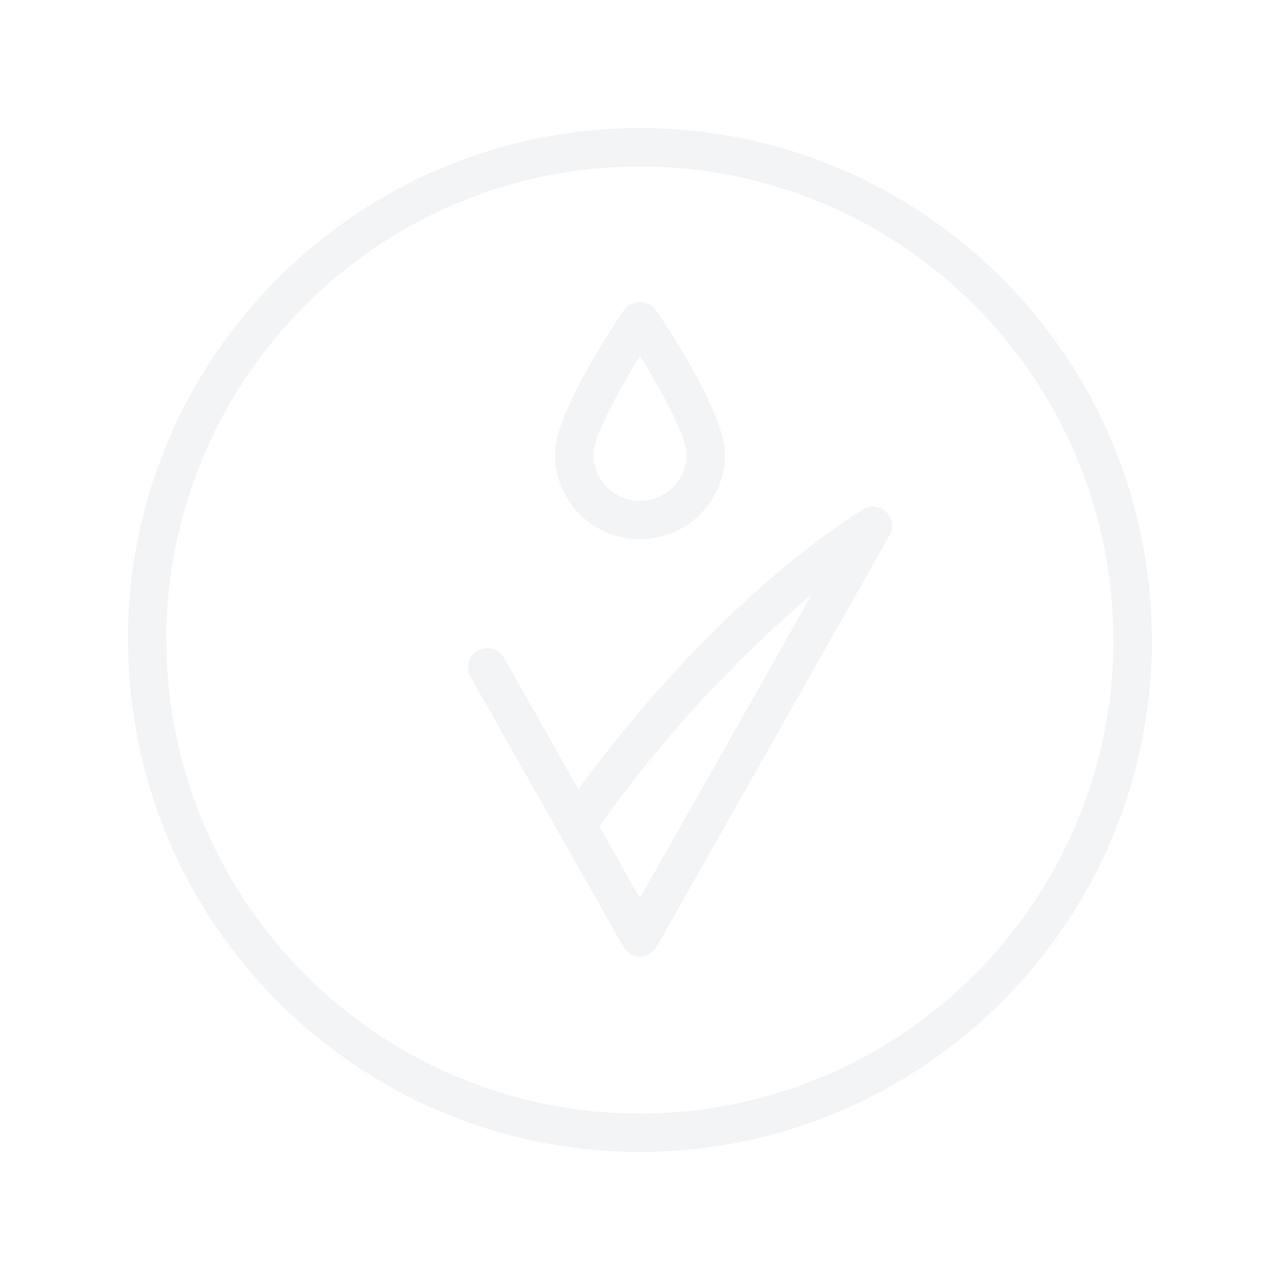 MINIGOLD Roundli Earrings